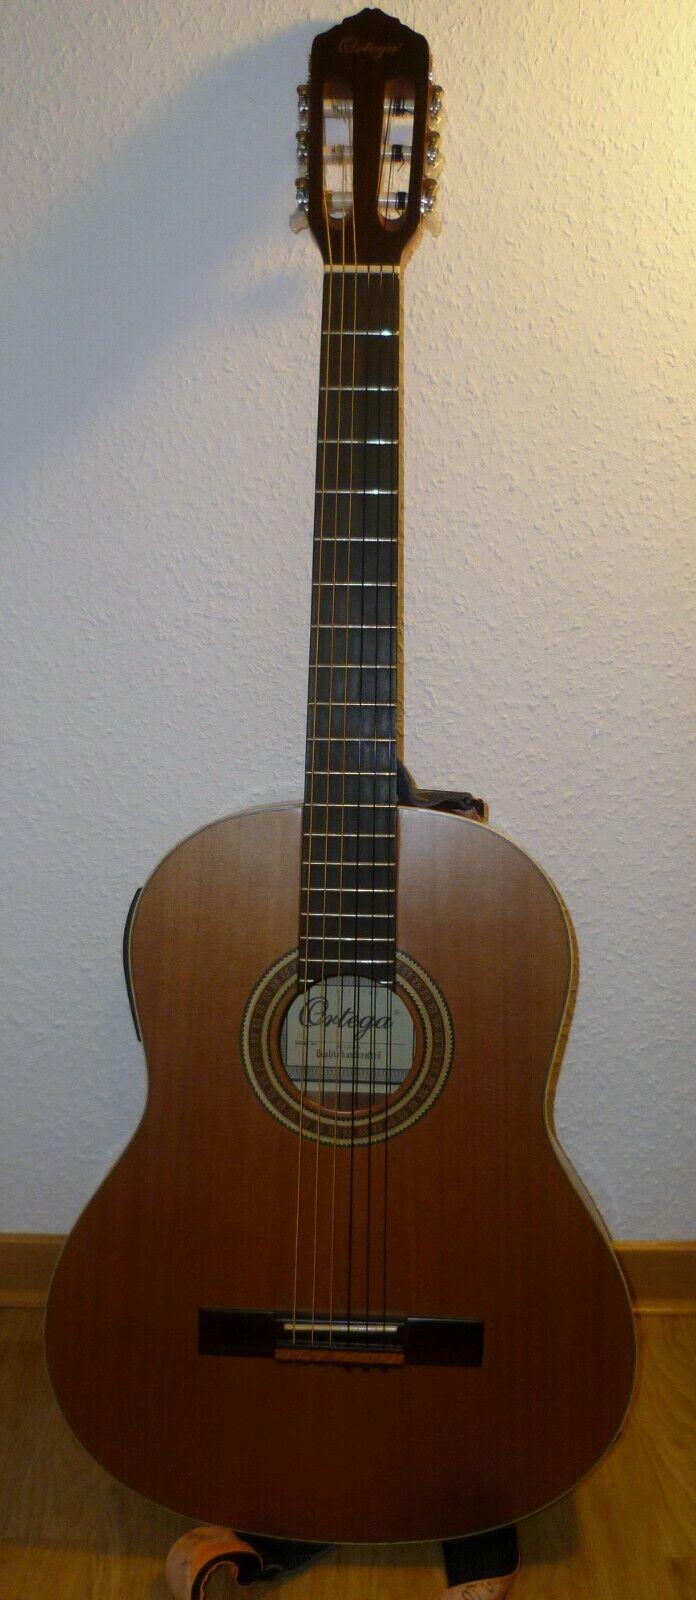 Ortega Konzertgitarre RE135SN inkl. Tasche + Gurt